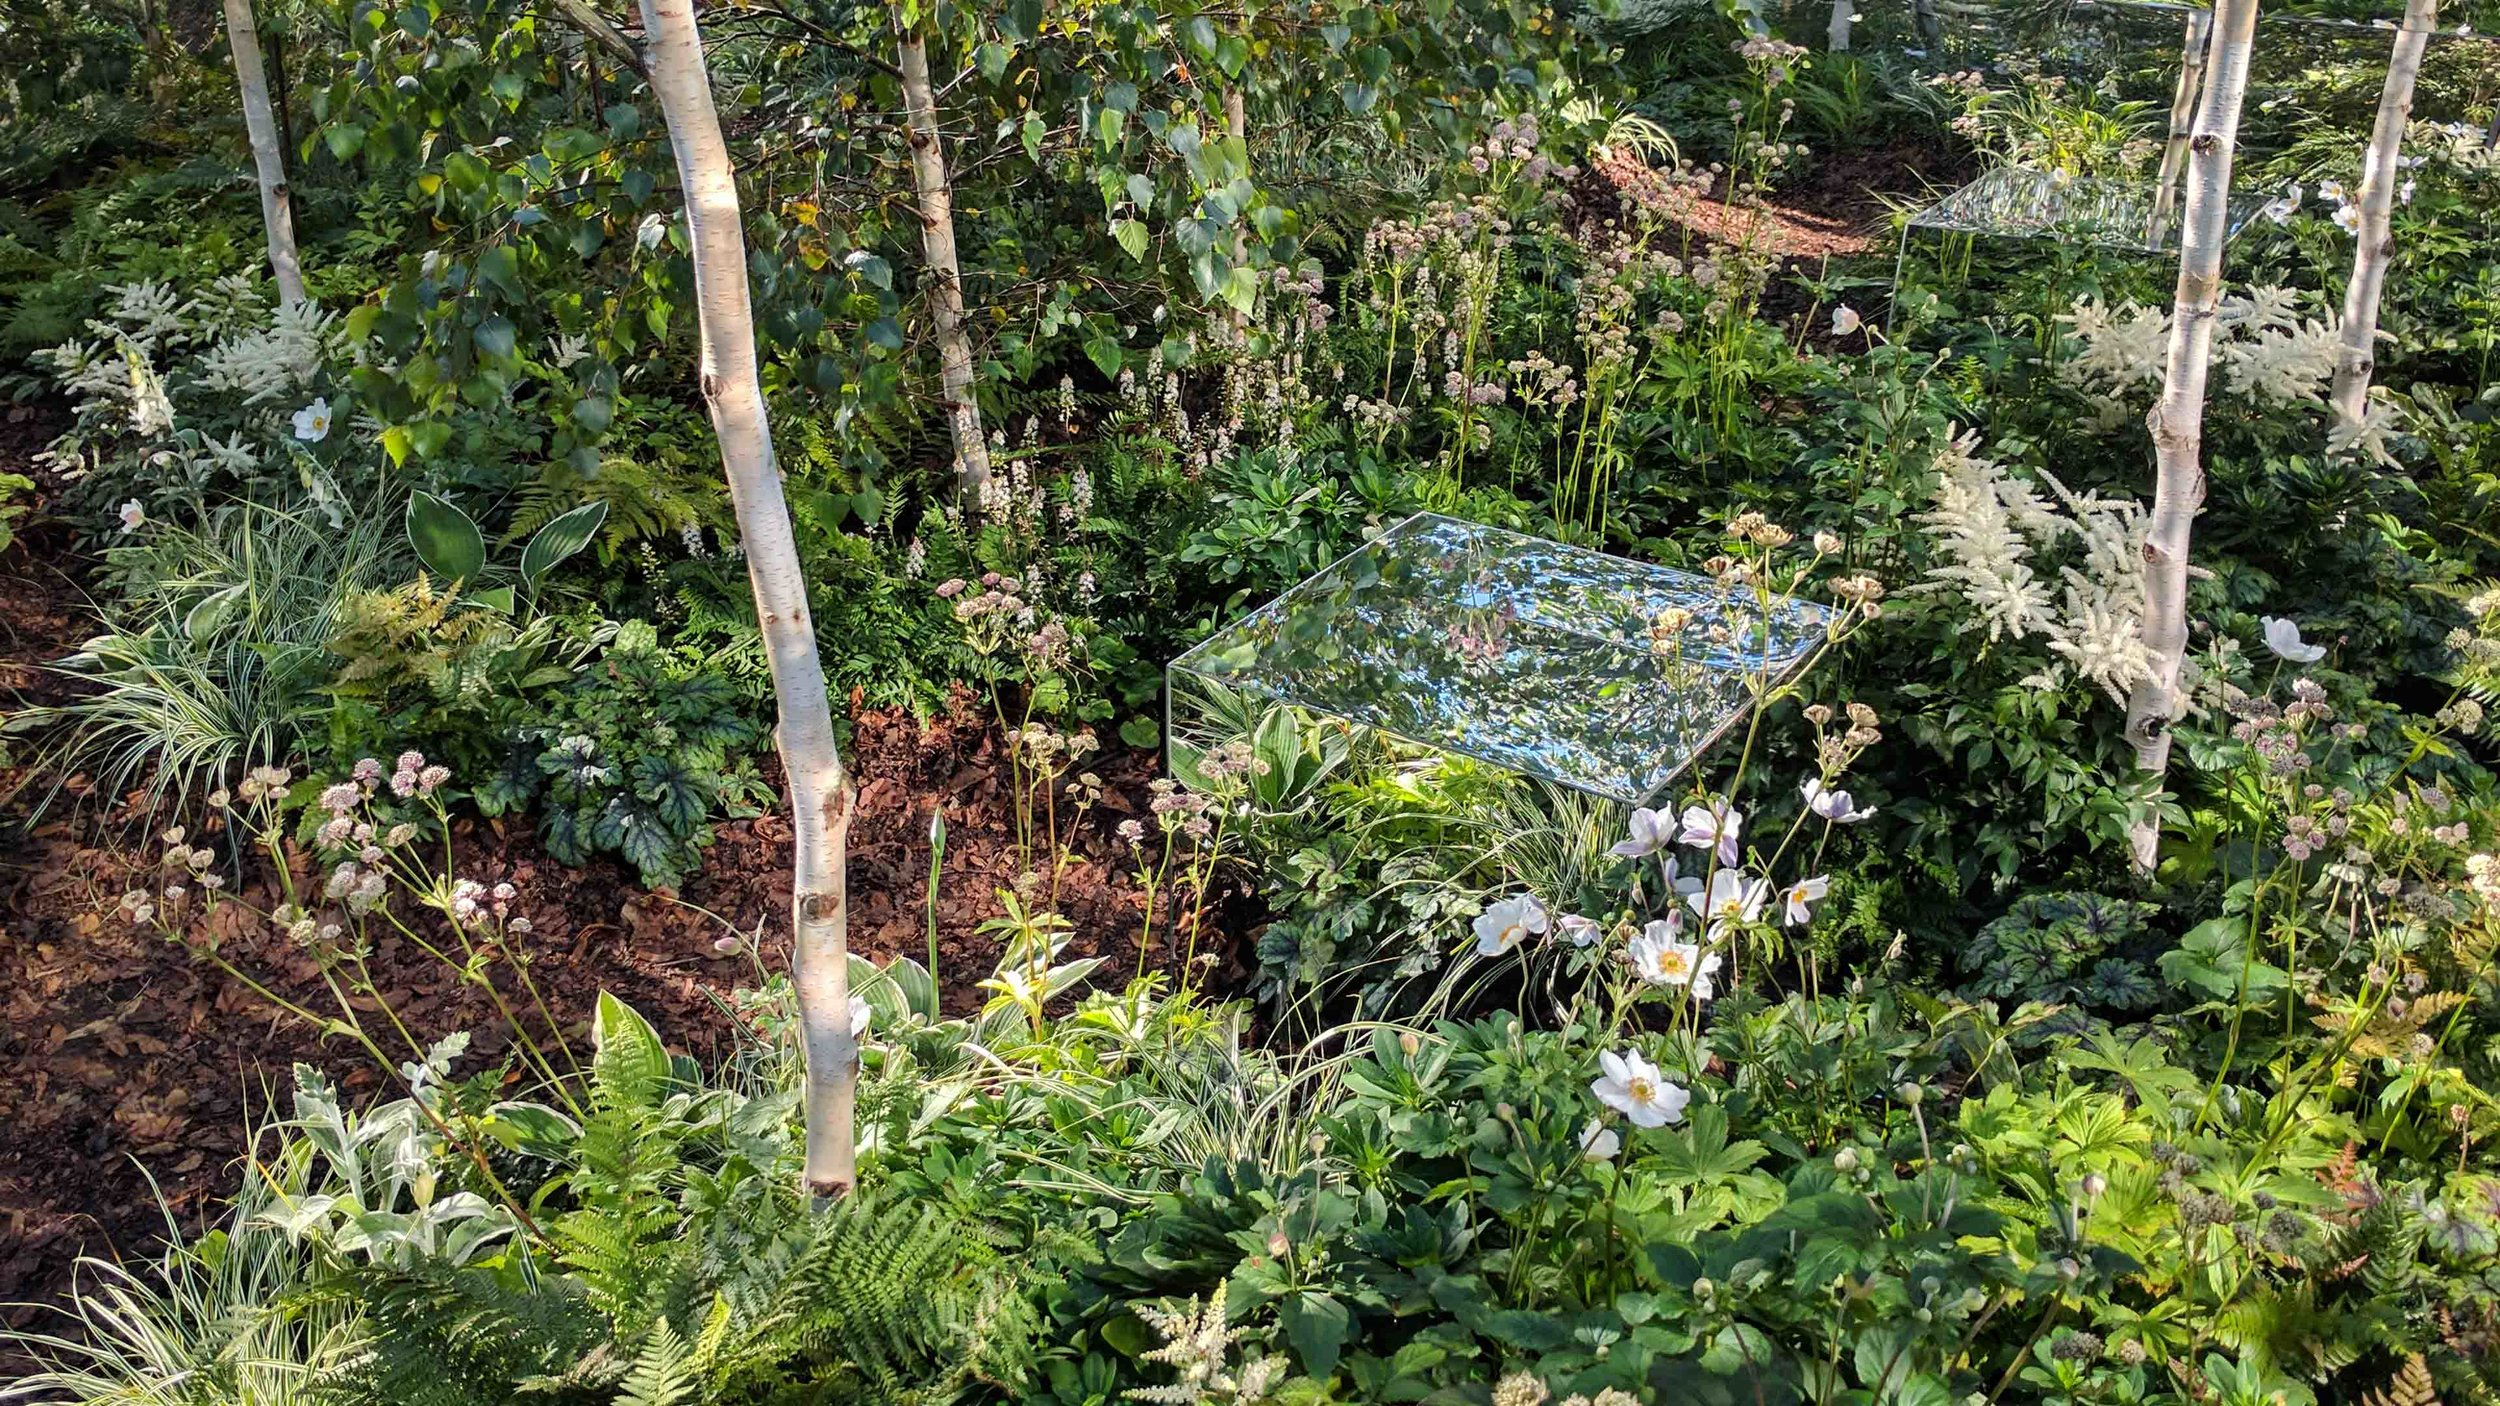 Southport Garden Design: Kuro: Inside The Mirrored Cube